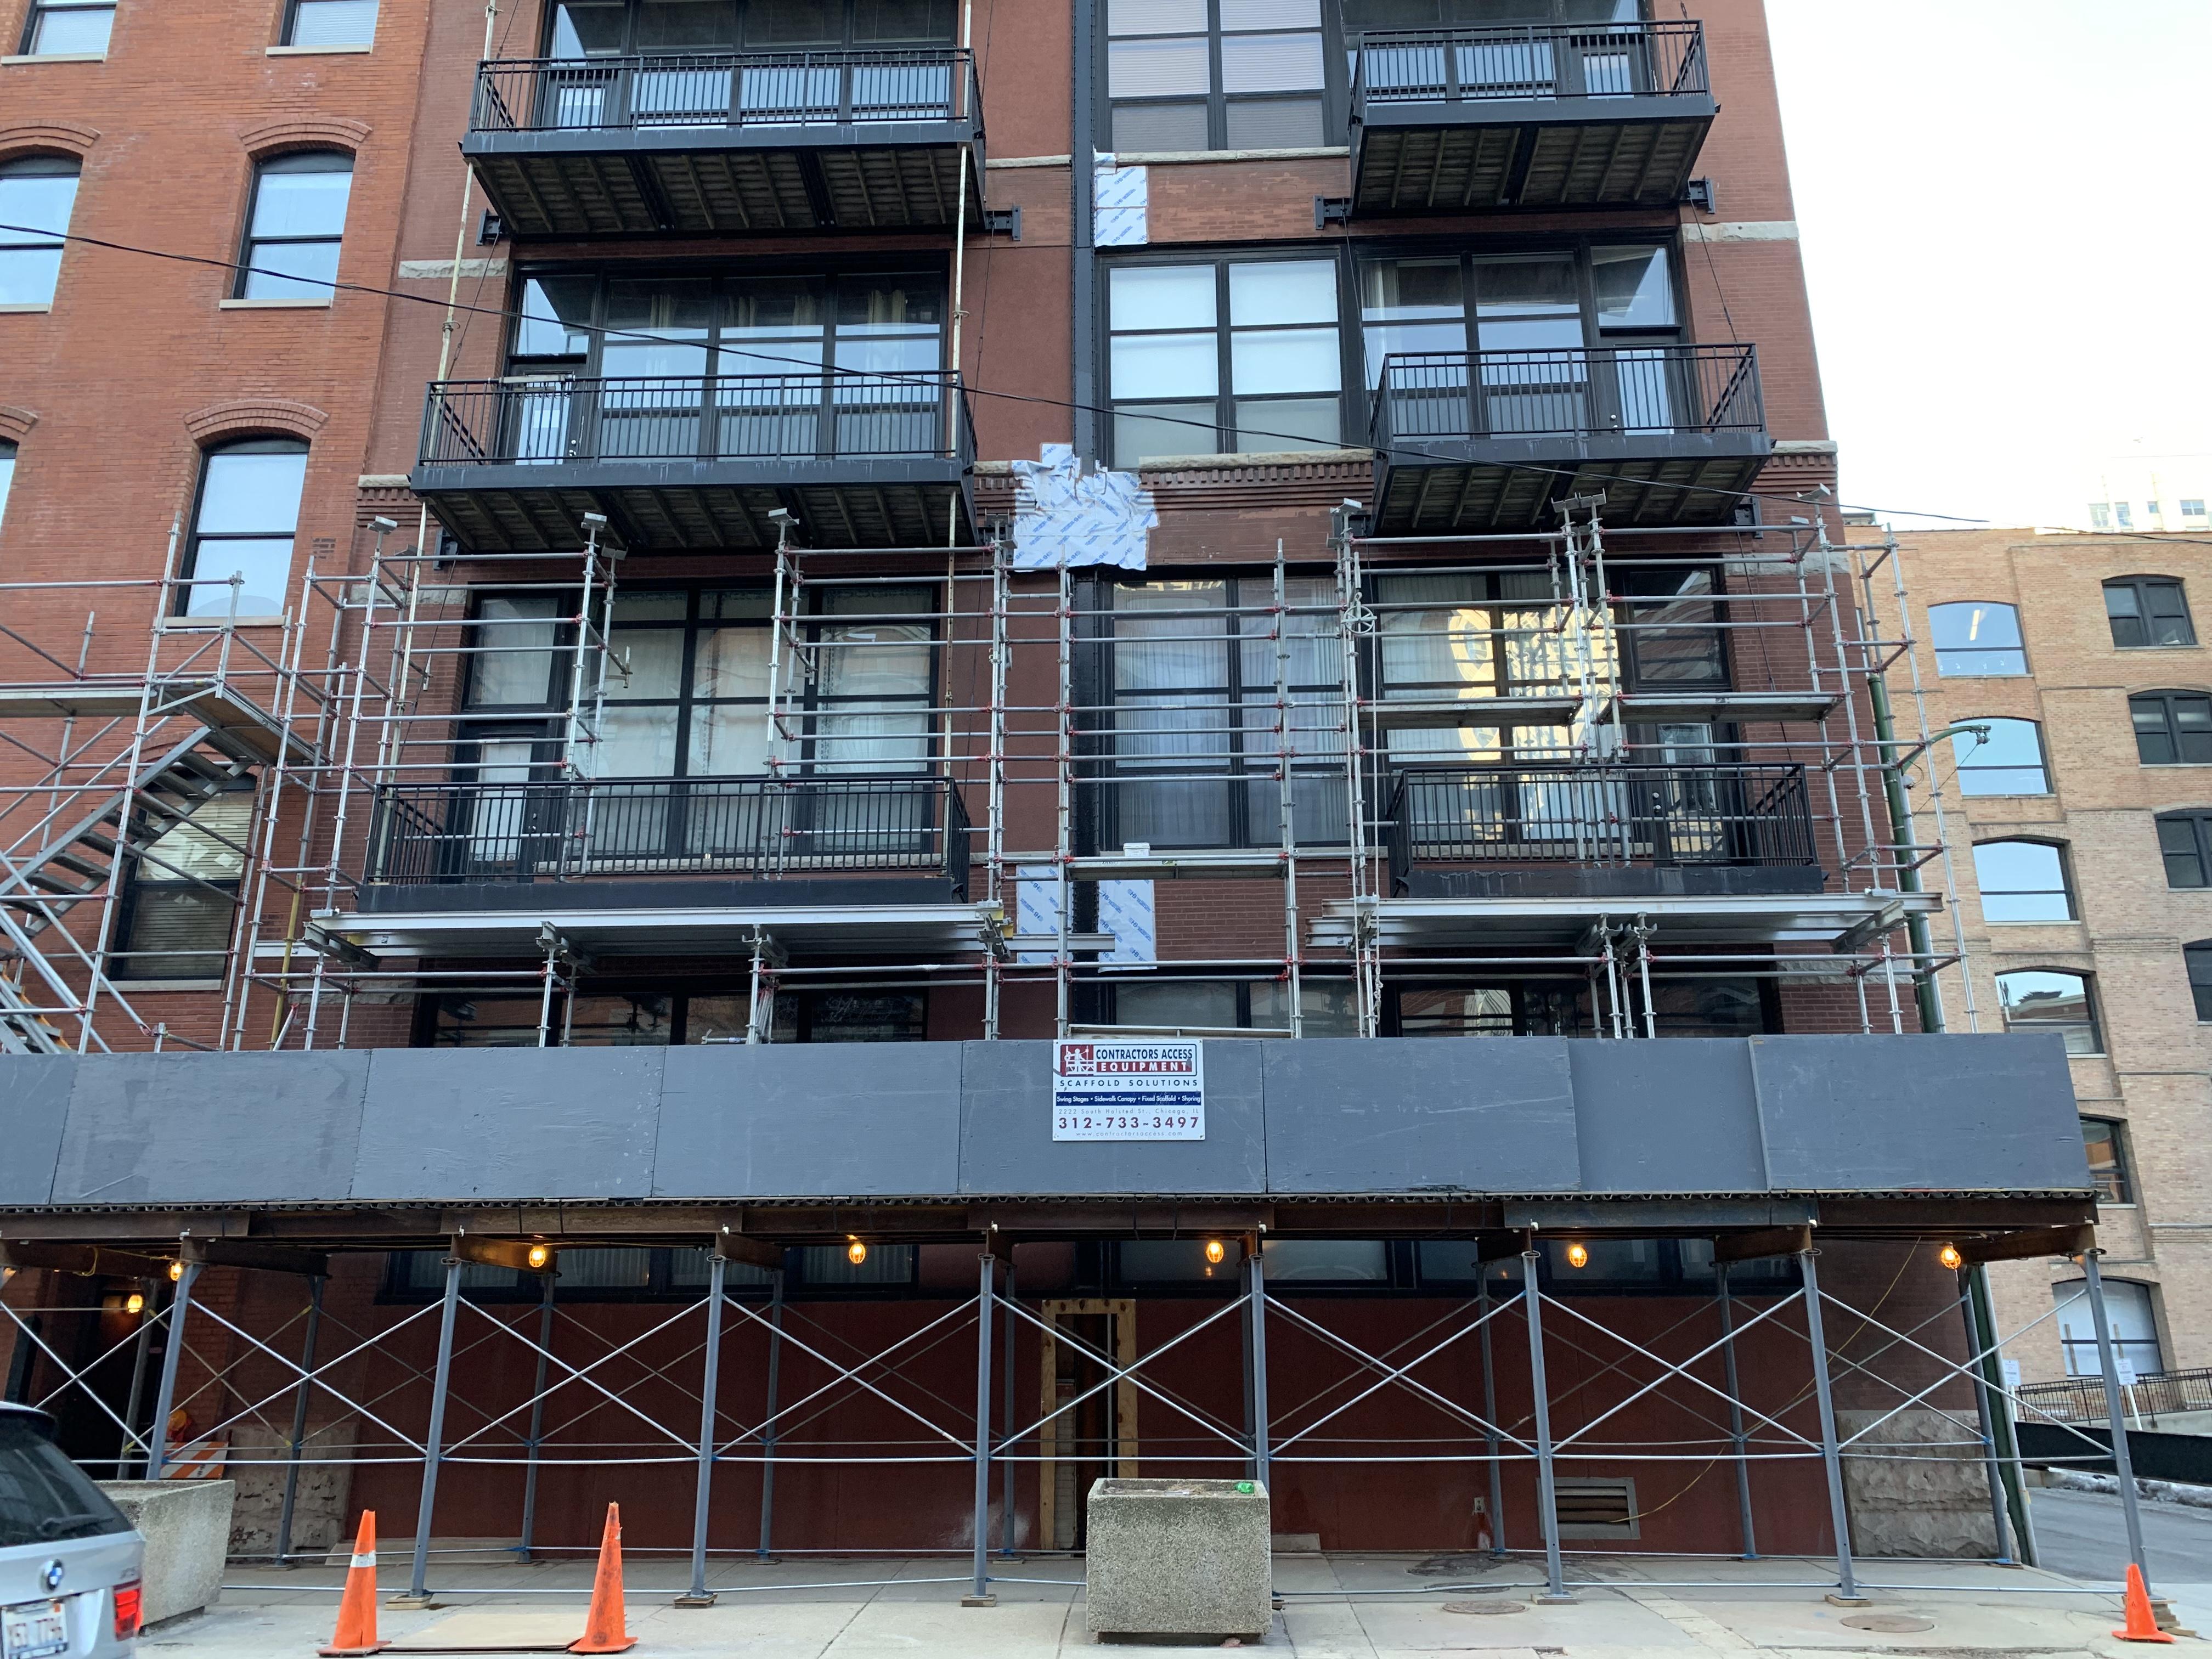 541 W. Fulton - Shoring & Tower scaffold 2